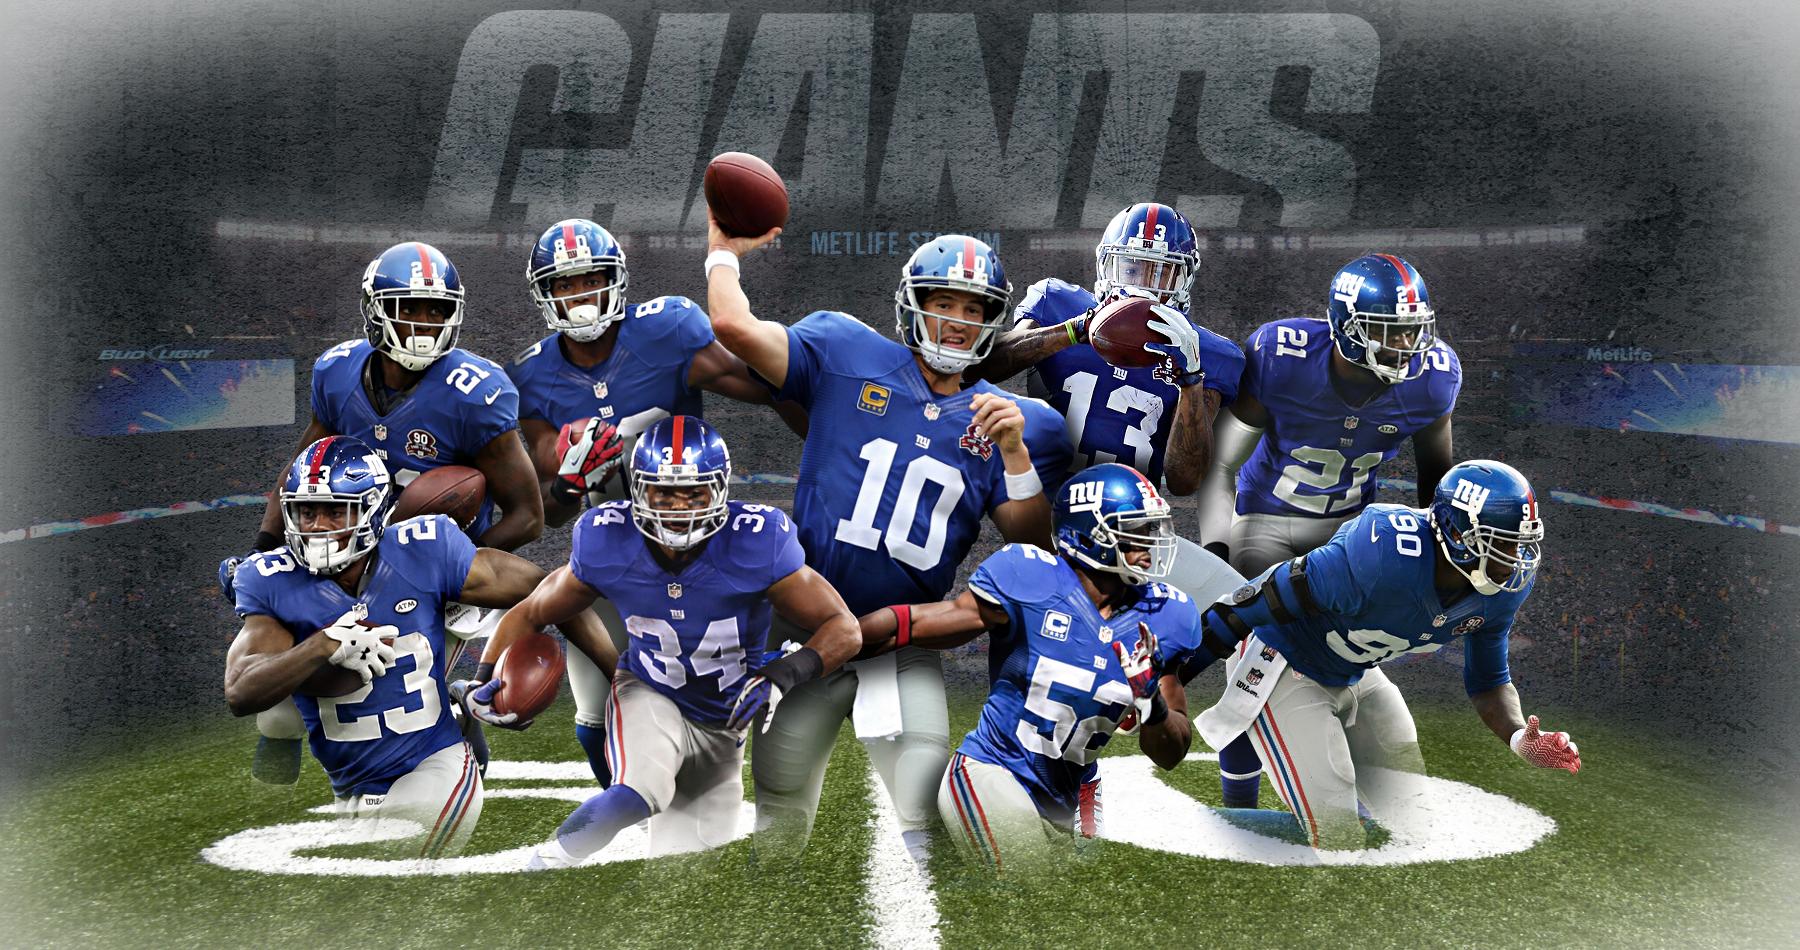 New York Giants Wallpaper Team By Alexbedard On Deviantart